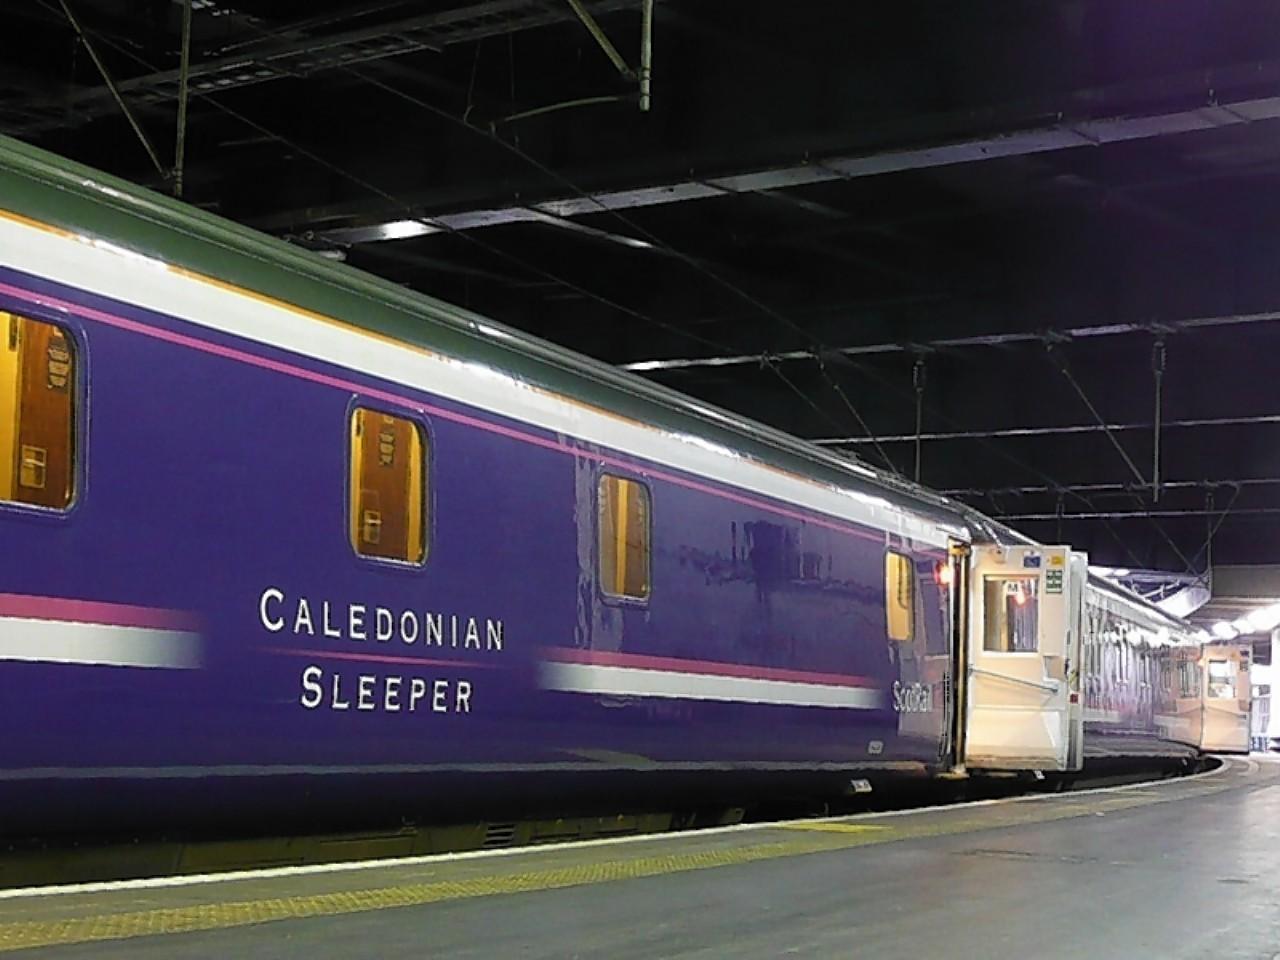 Opinions On Caledonian Sleeper